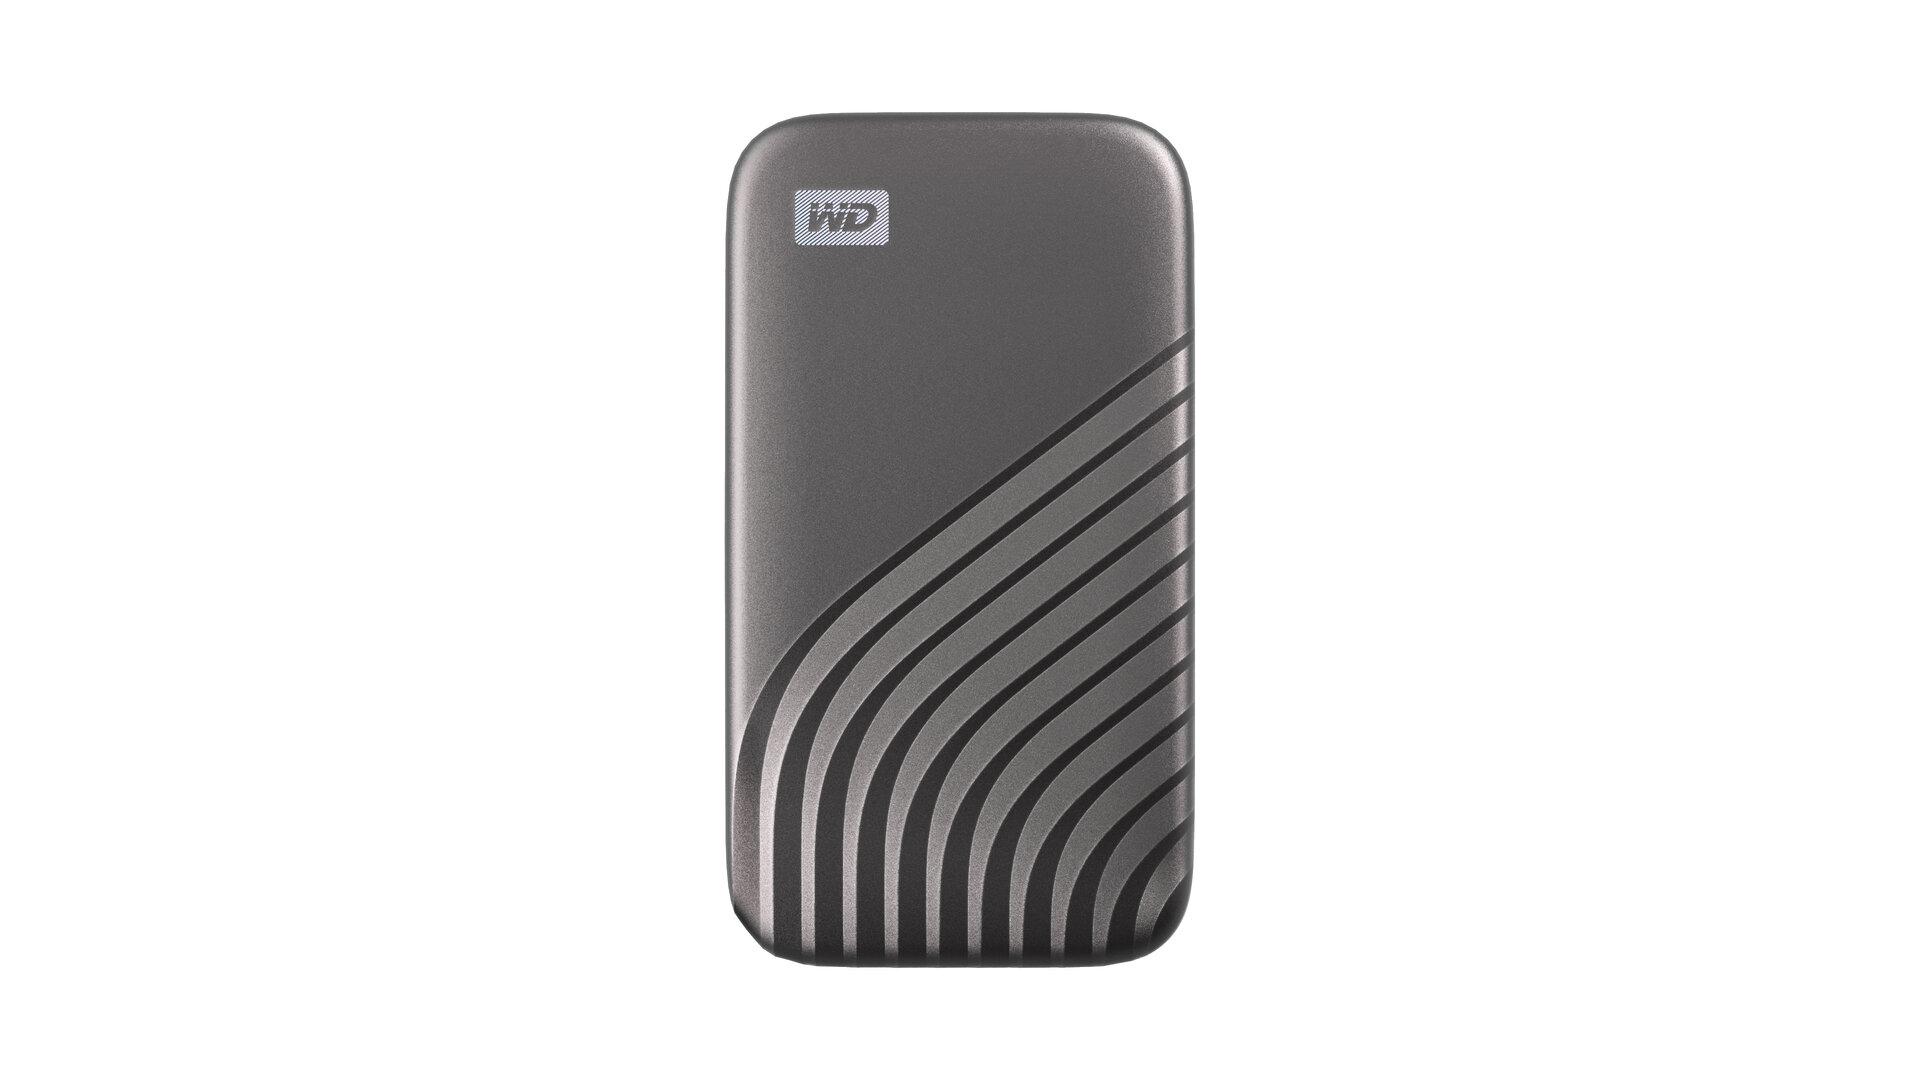 WD My Passport SSD (2020)